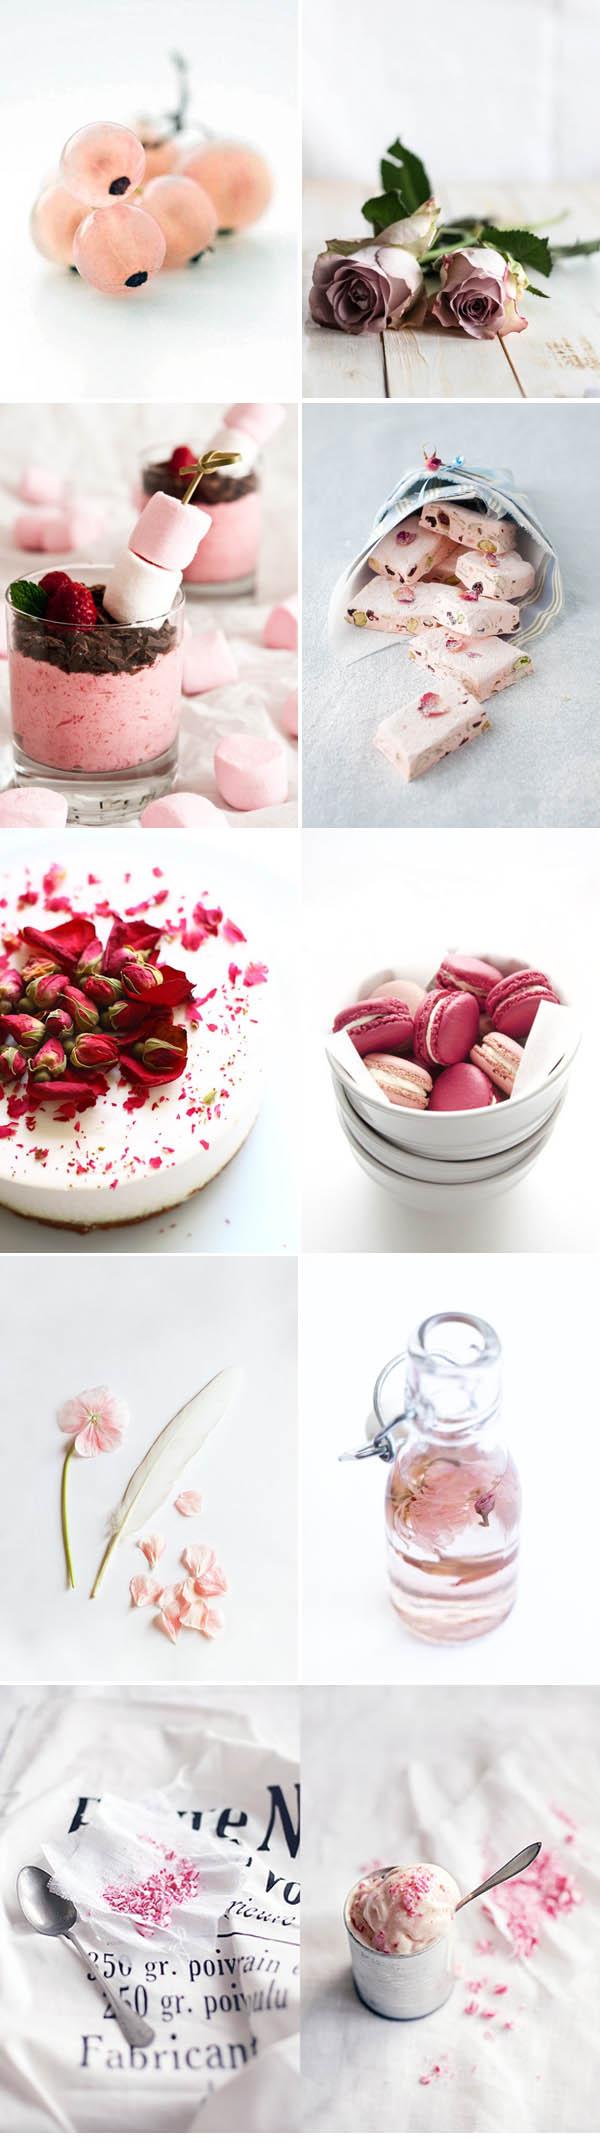 Rosa collage